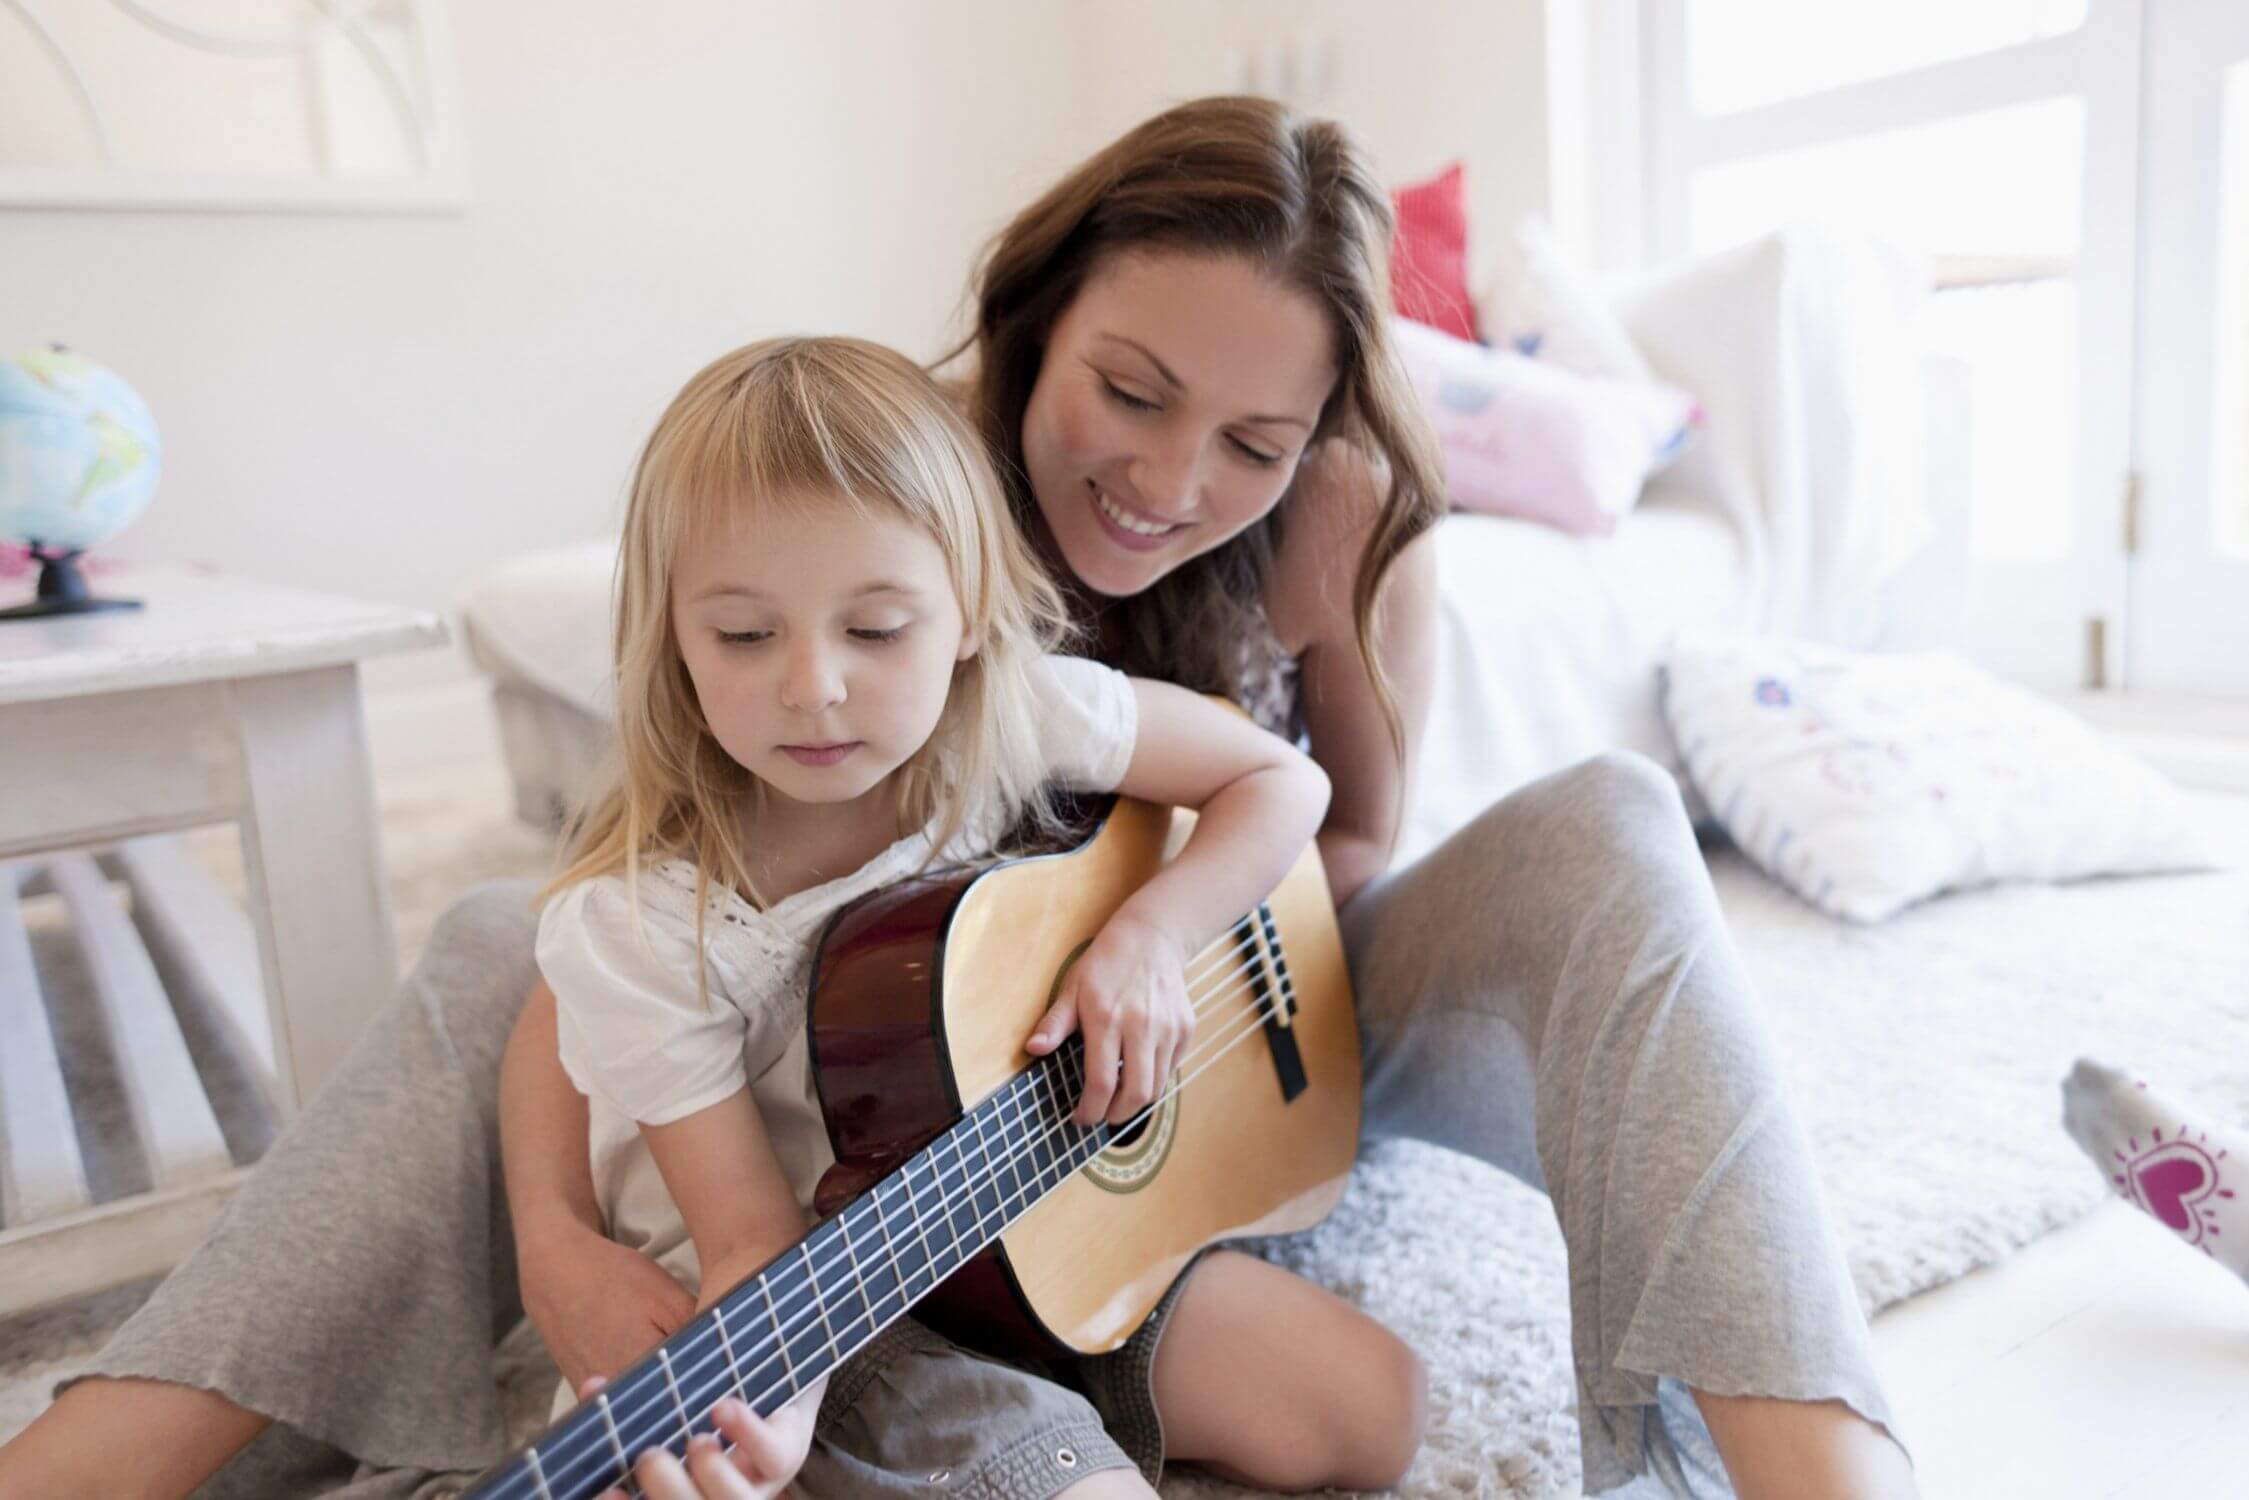 La música como forma de aprendizaje